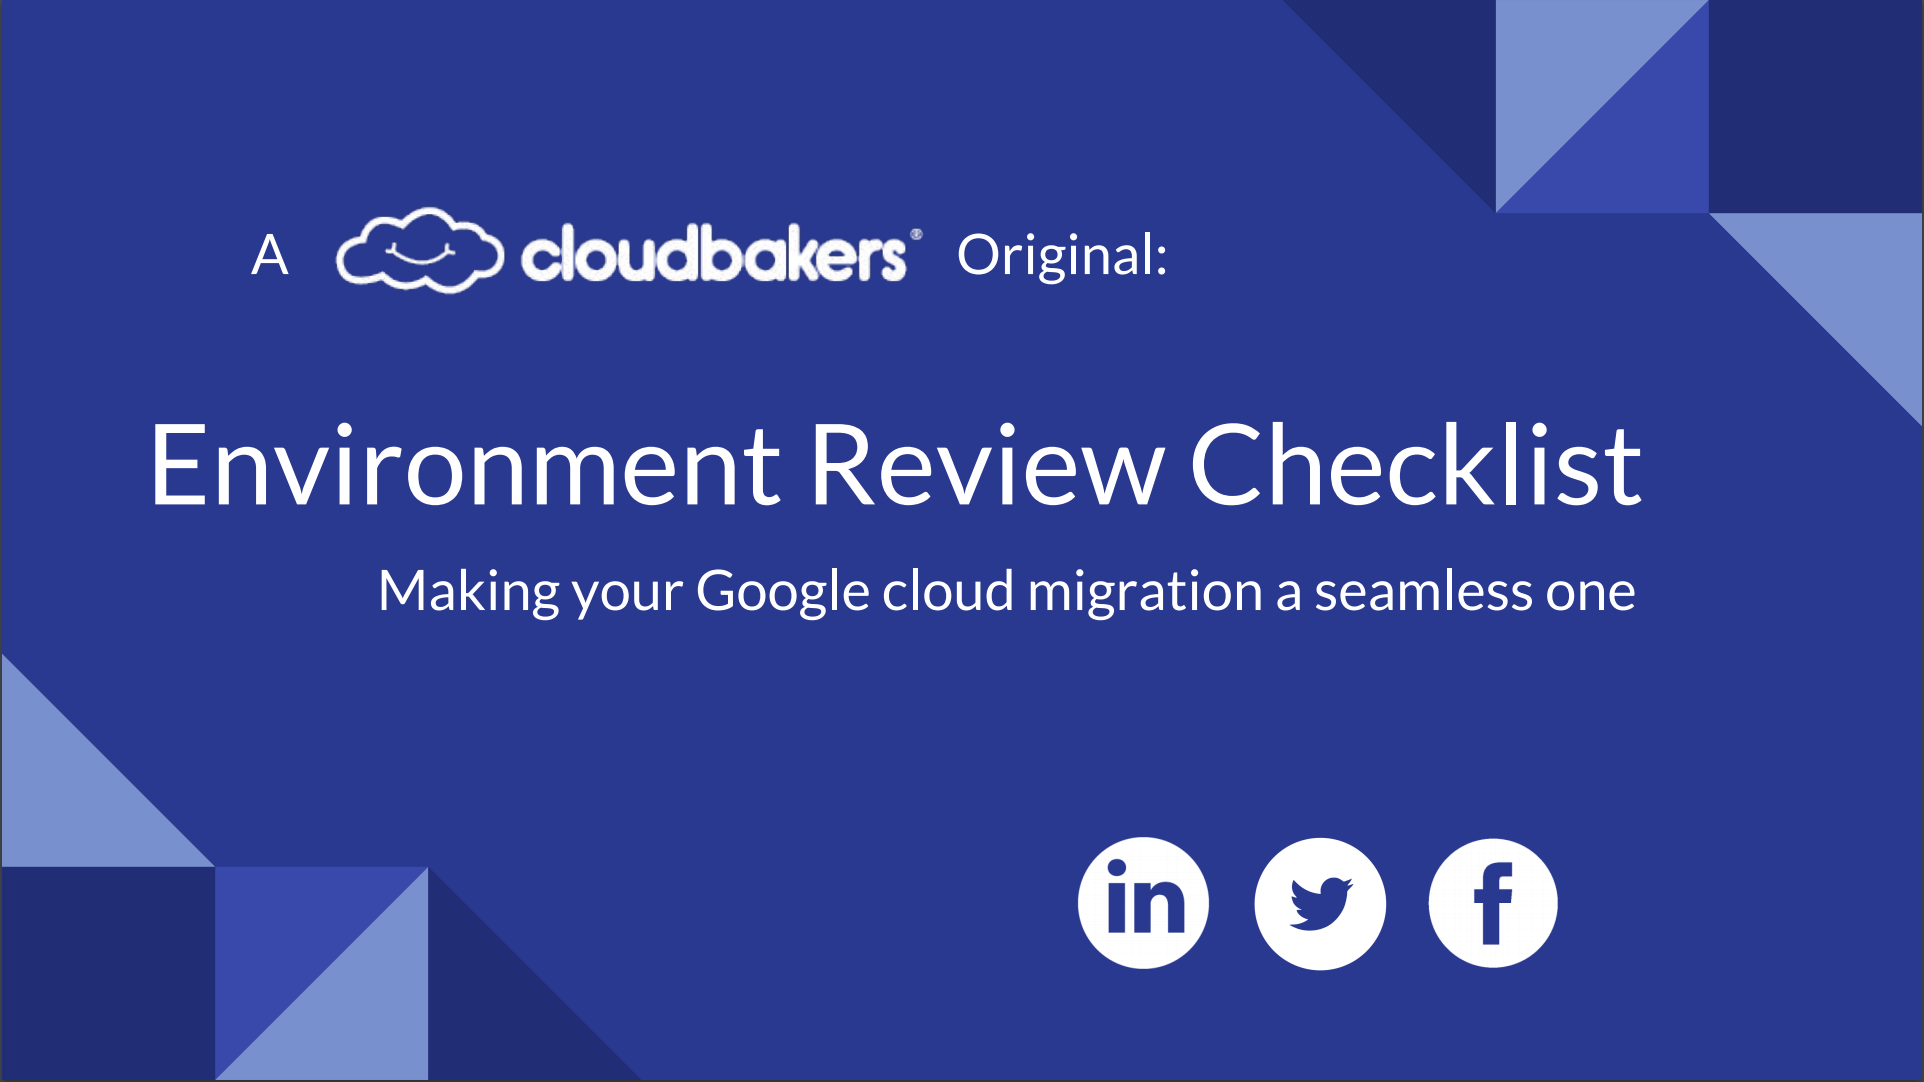 environment review process checklist icon